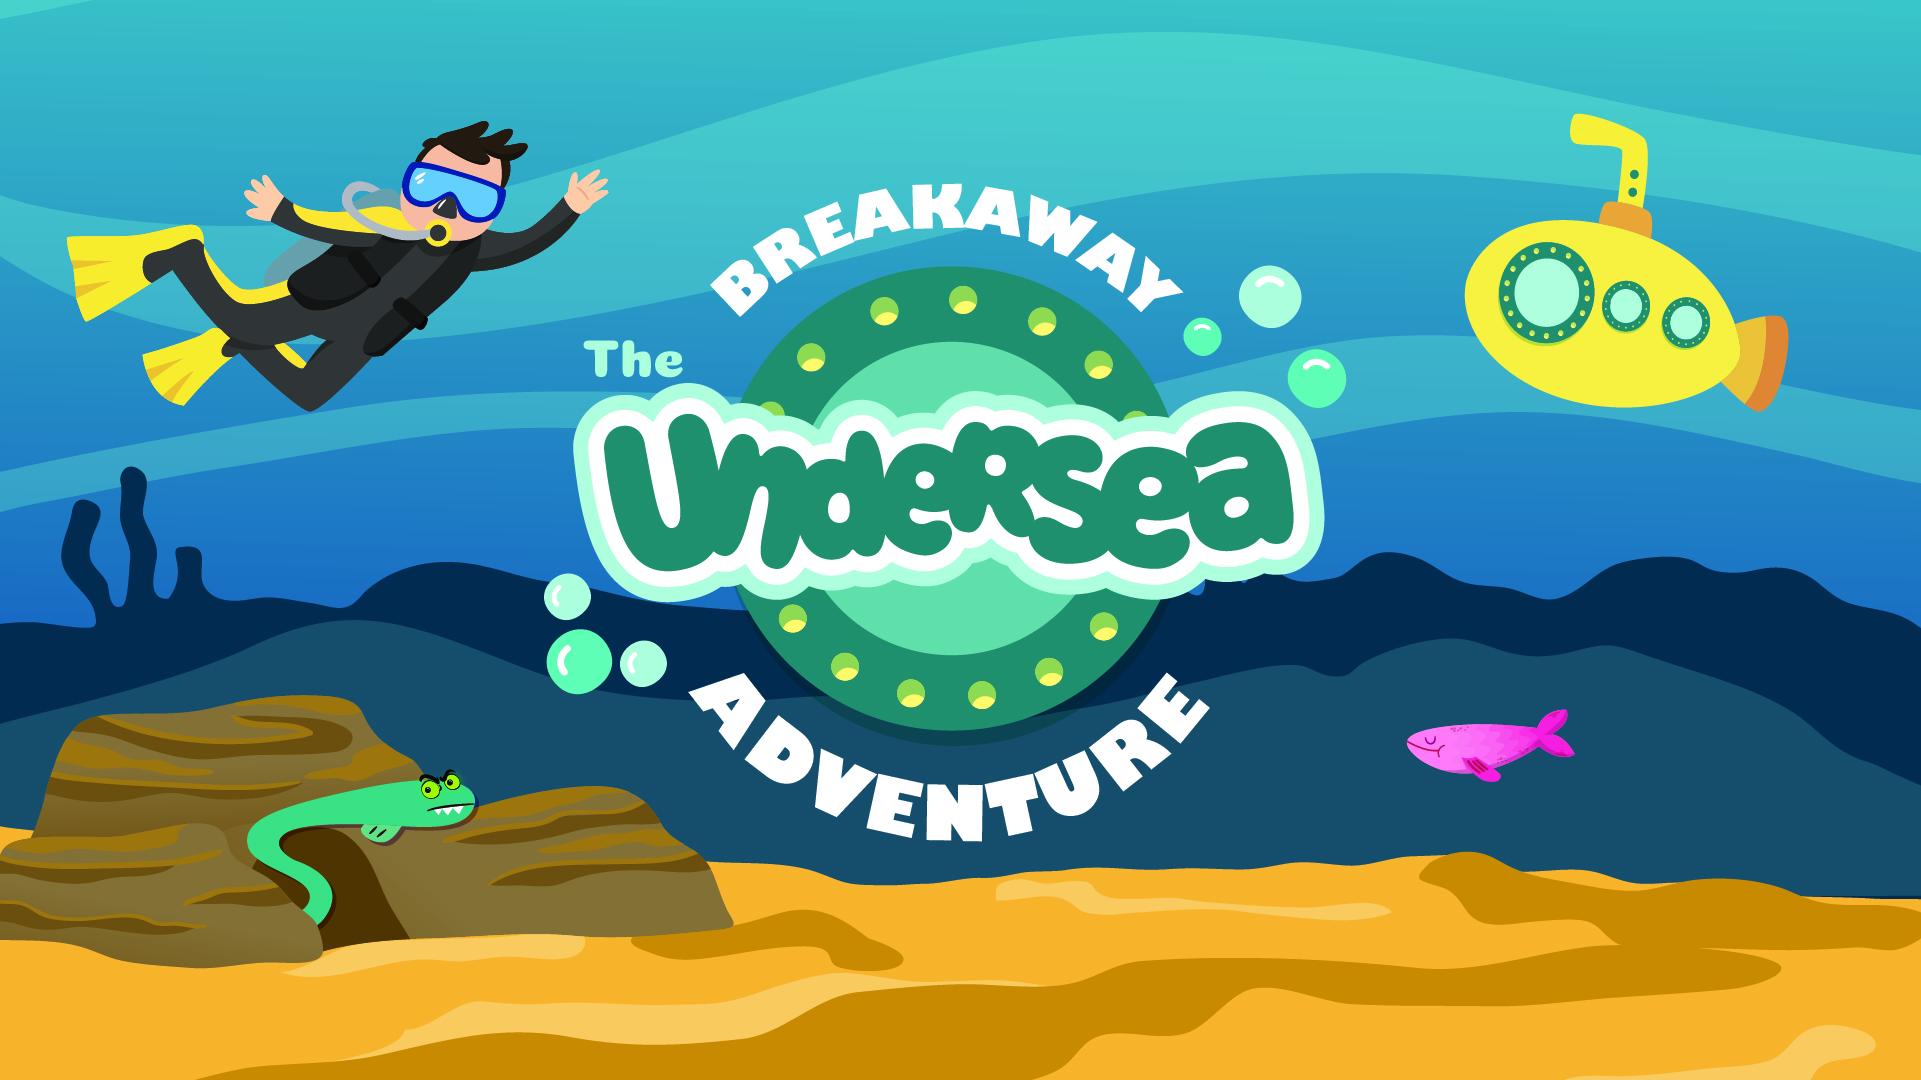 Breakaway the undersea adventure artboard 1 copy v3